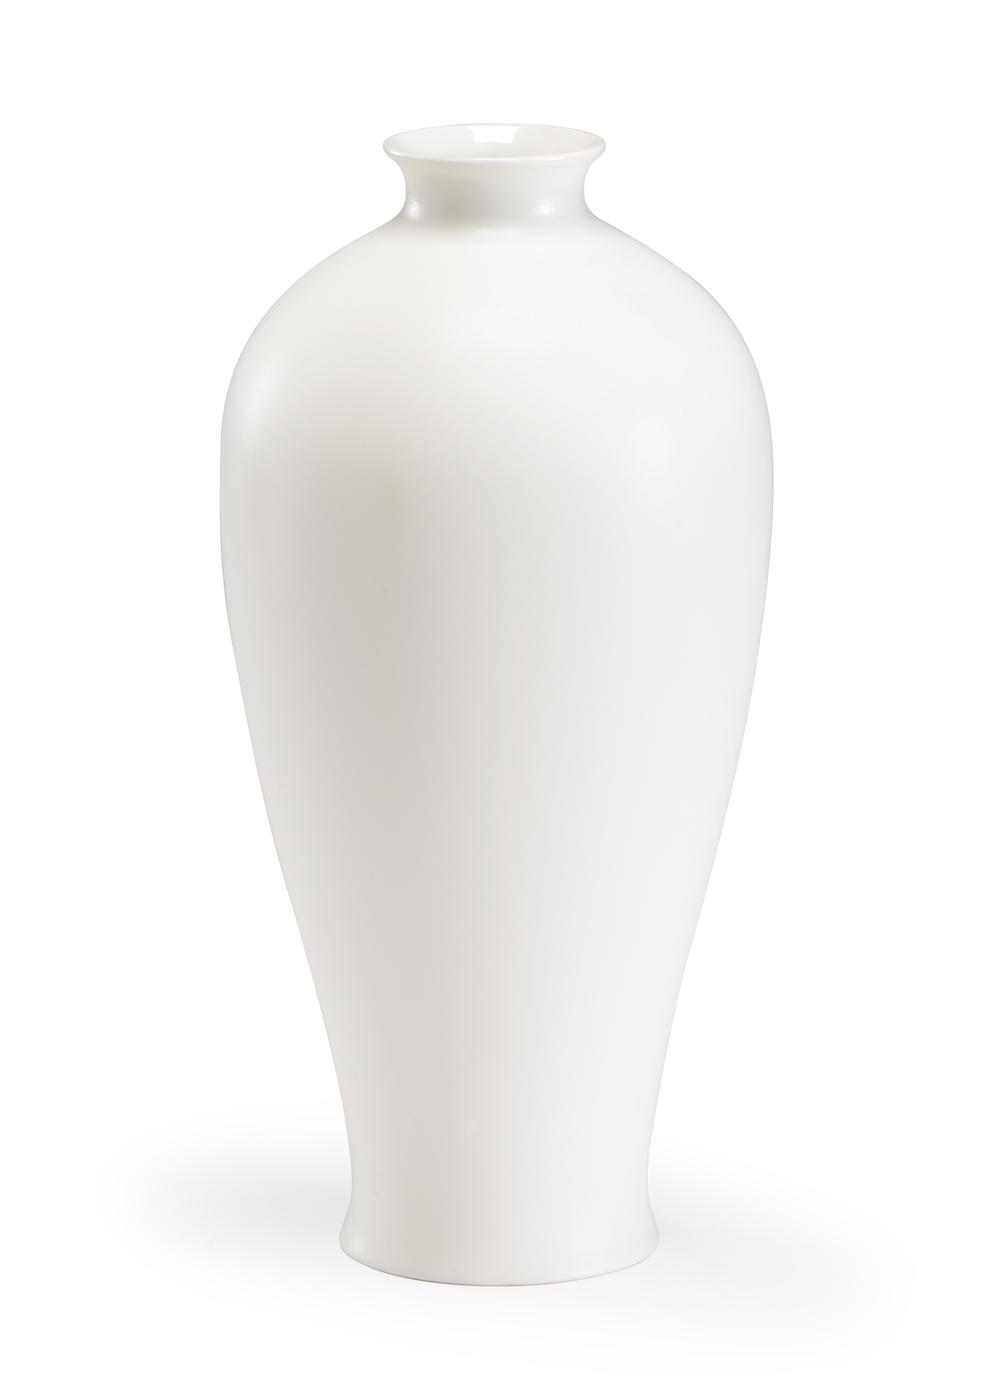 Chelsea House - Putuo Vase